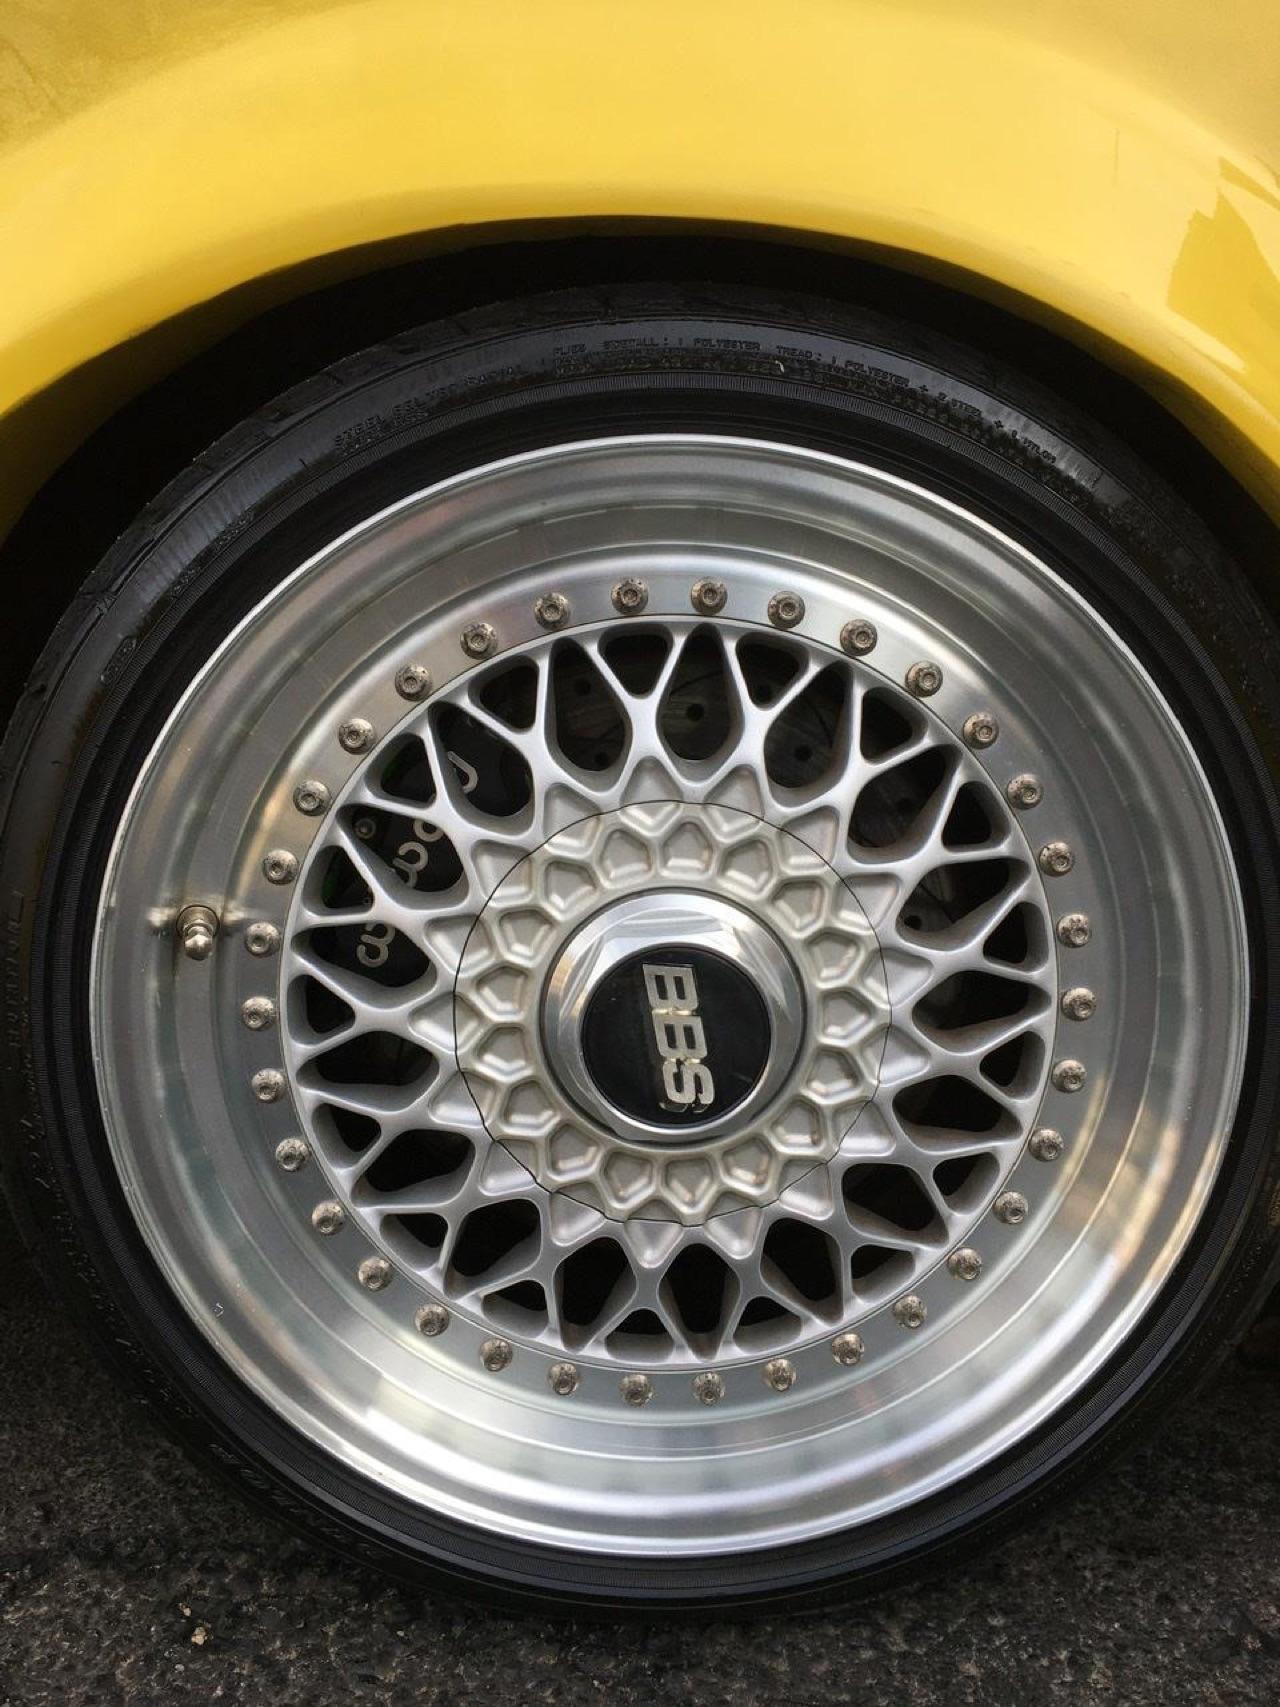 '87 VW Golf Cab VR6... Booyaka, booyaka ! 22